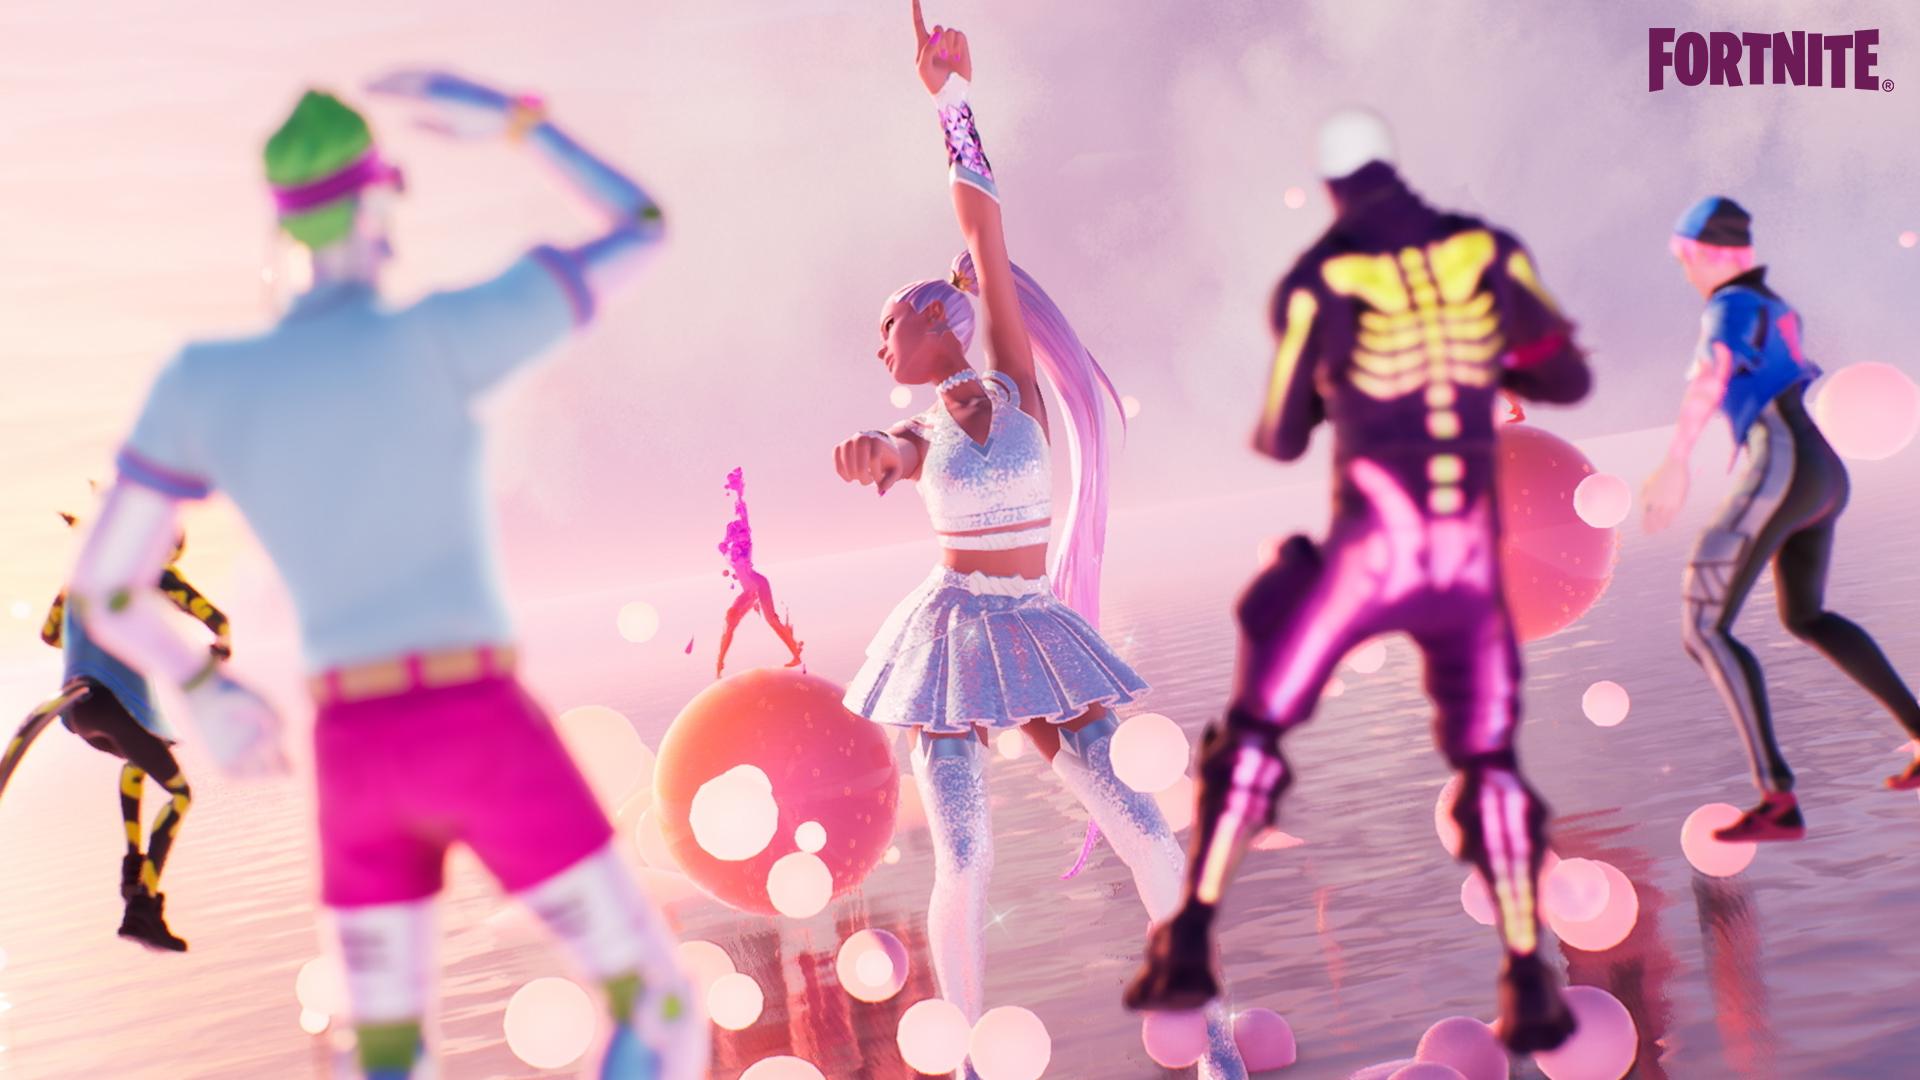 ariana grande fortnite dance